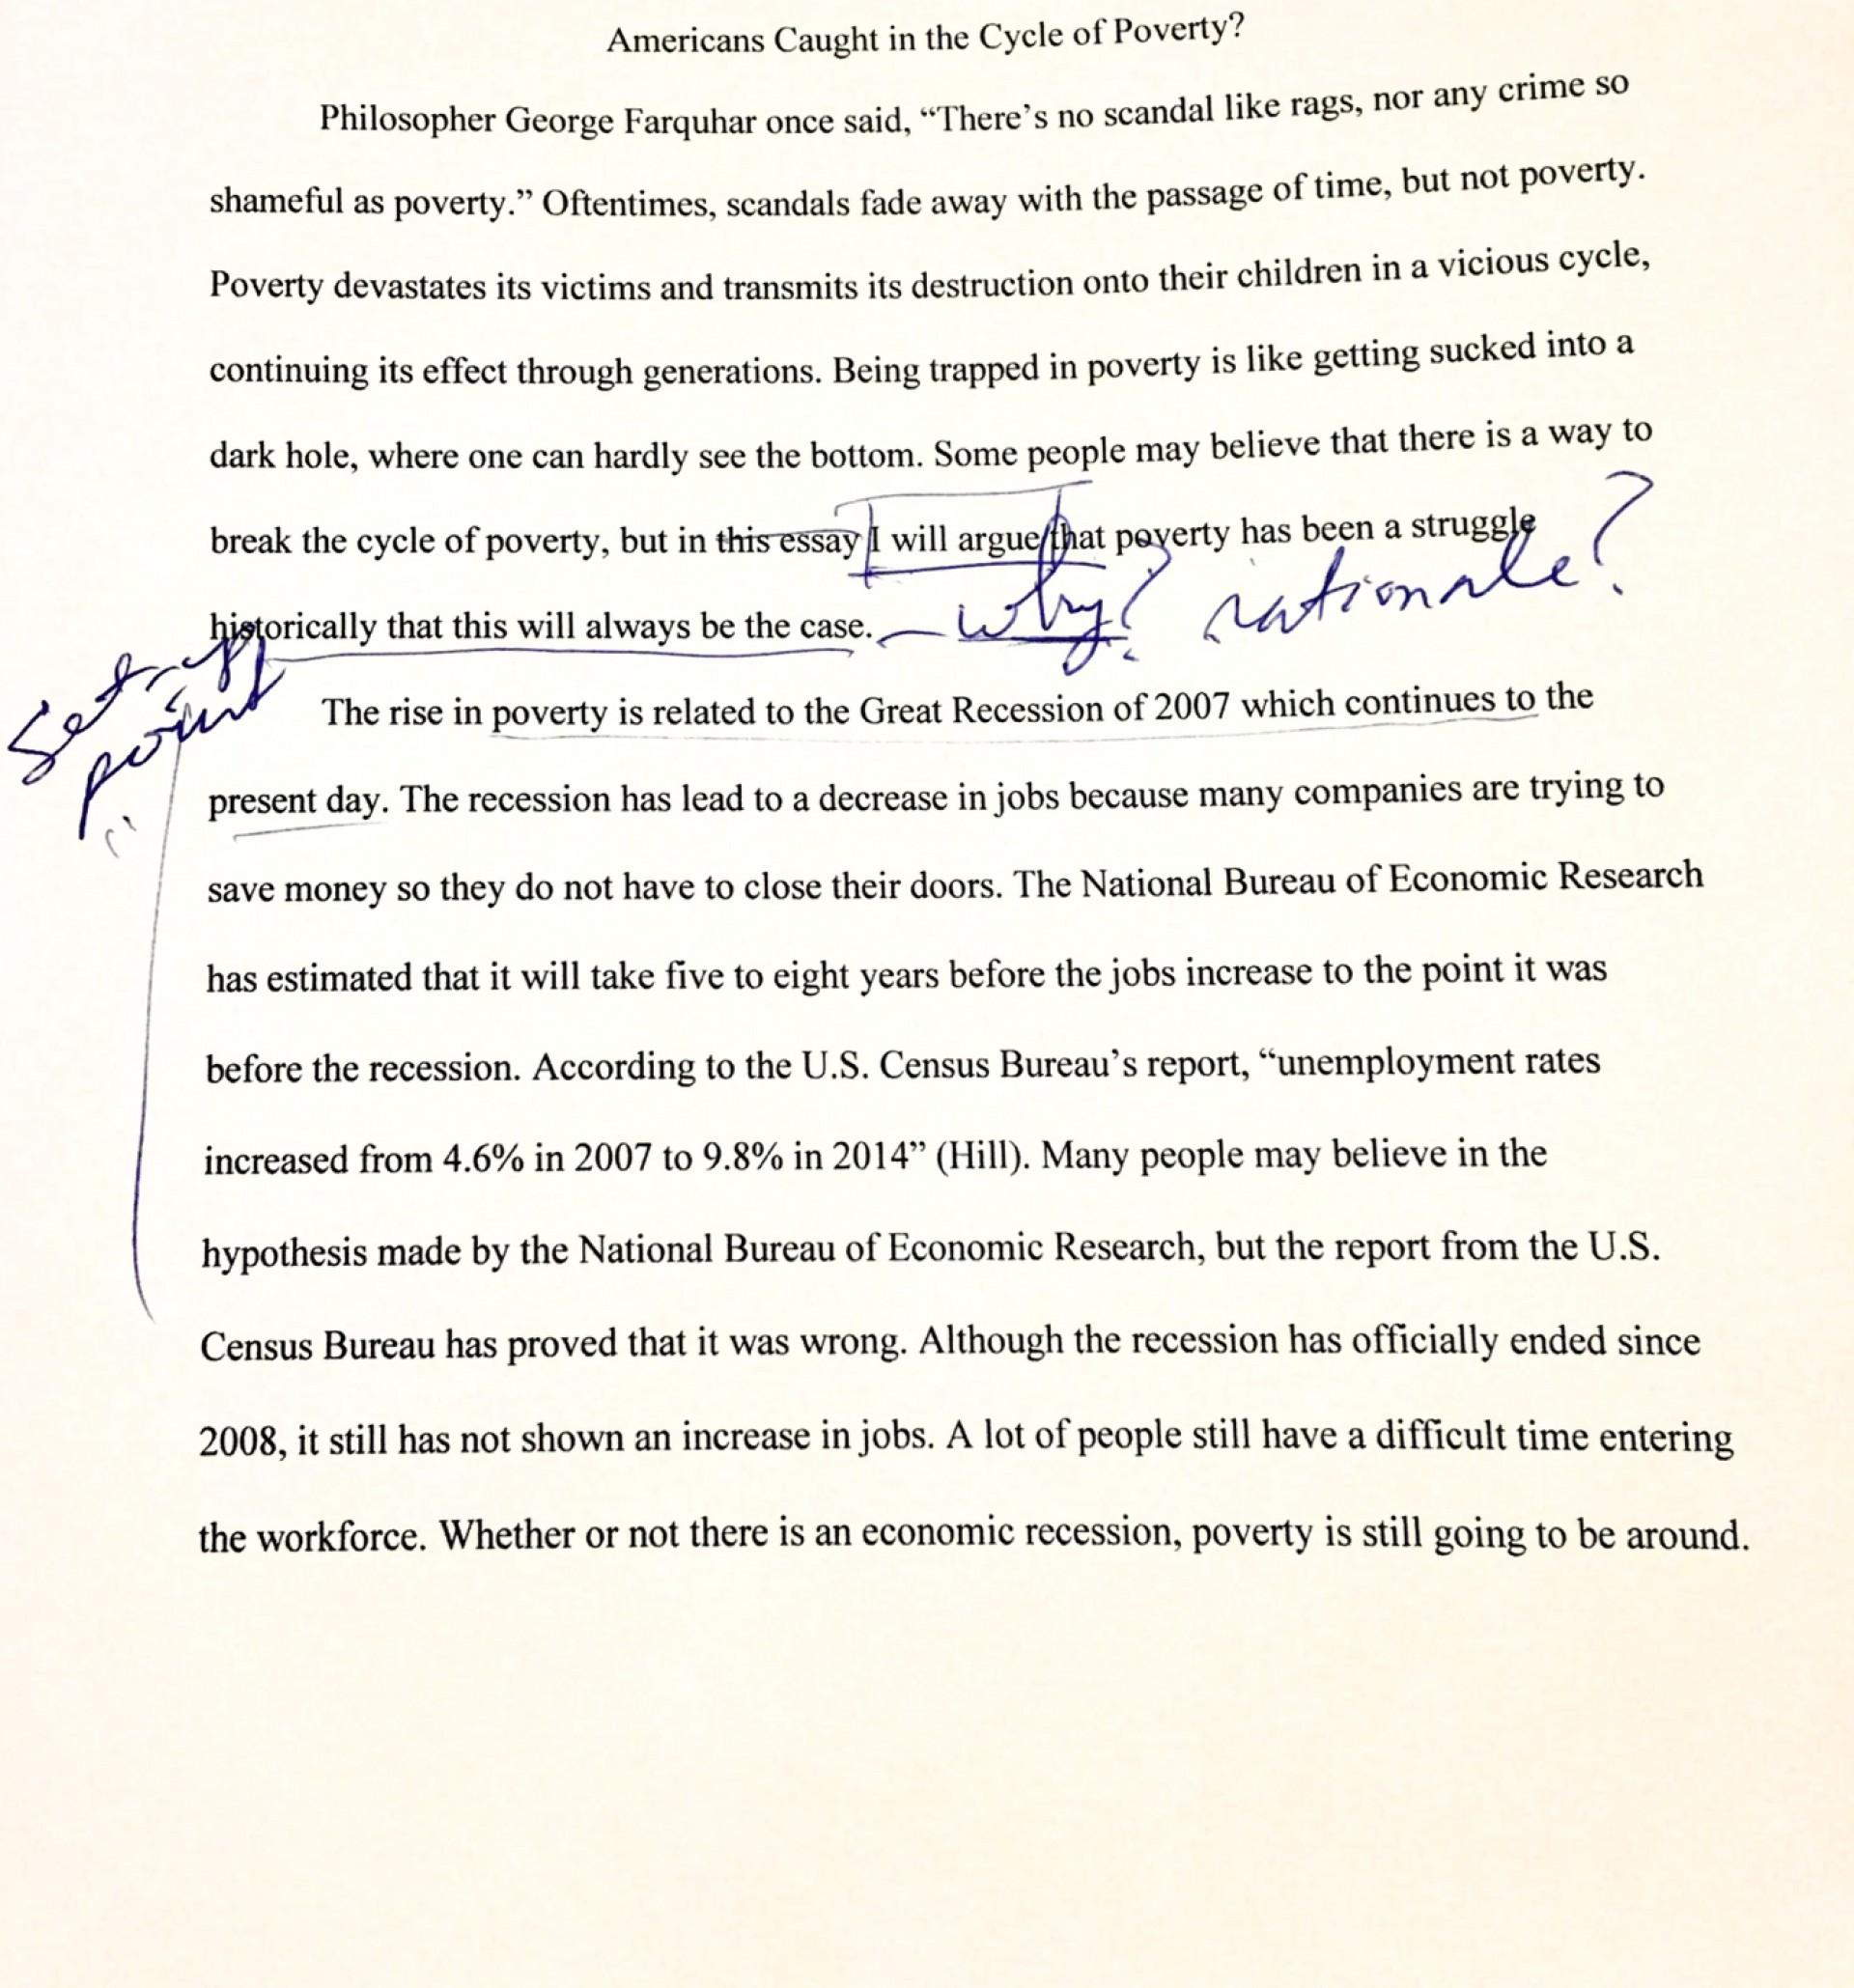 001 Paraphrase Essay Stirring Means On Criticism Paraphrasing Topics 1920